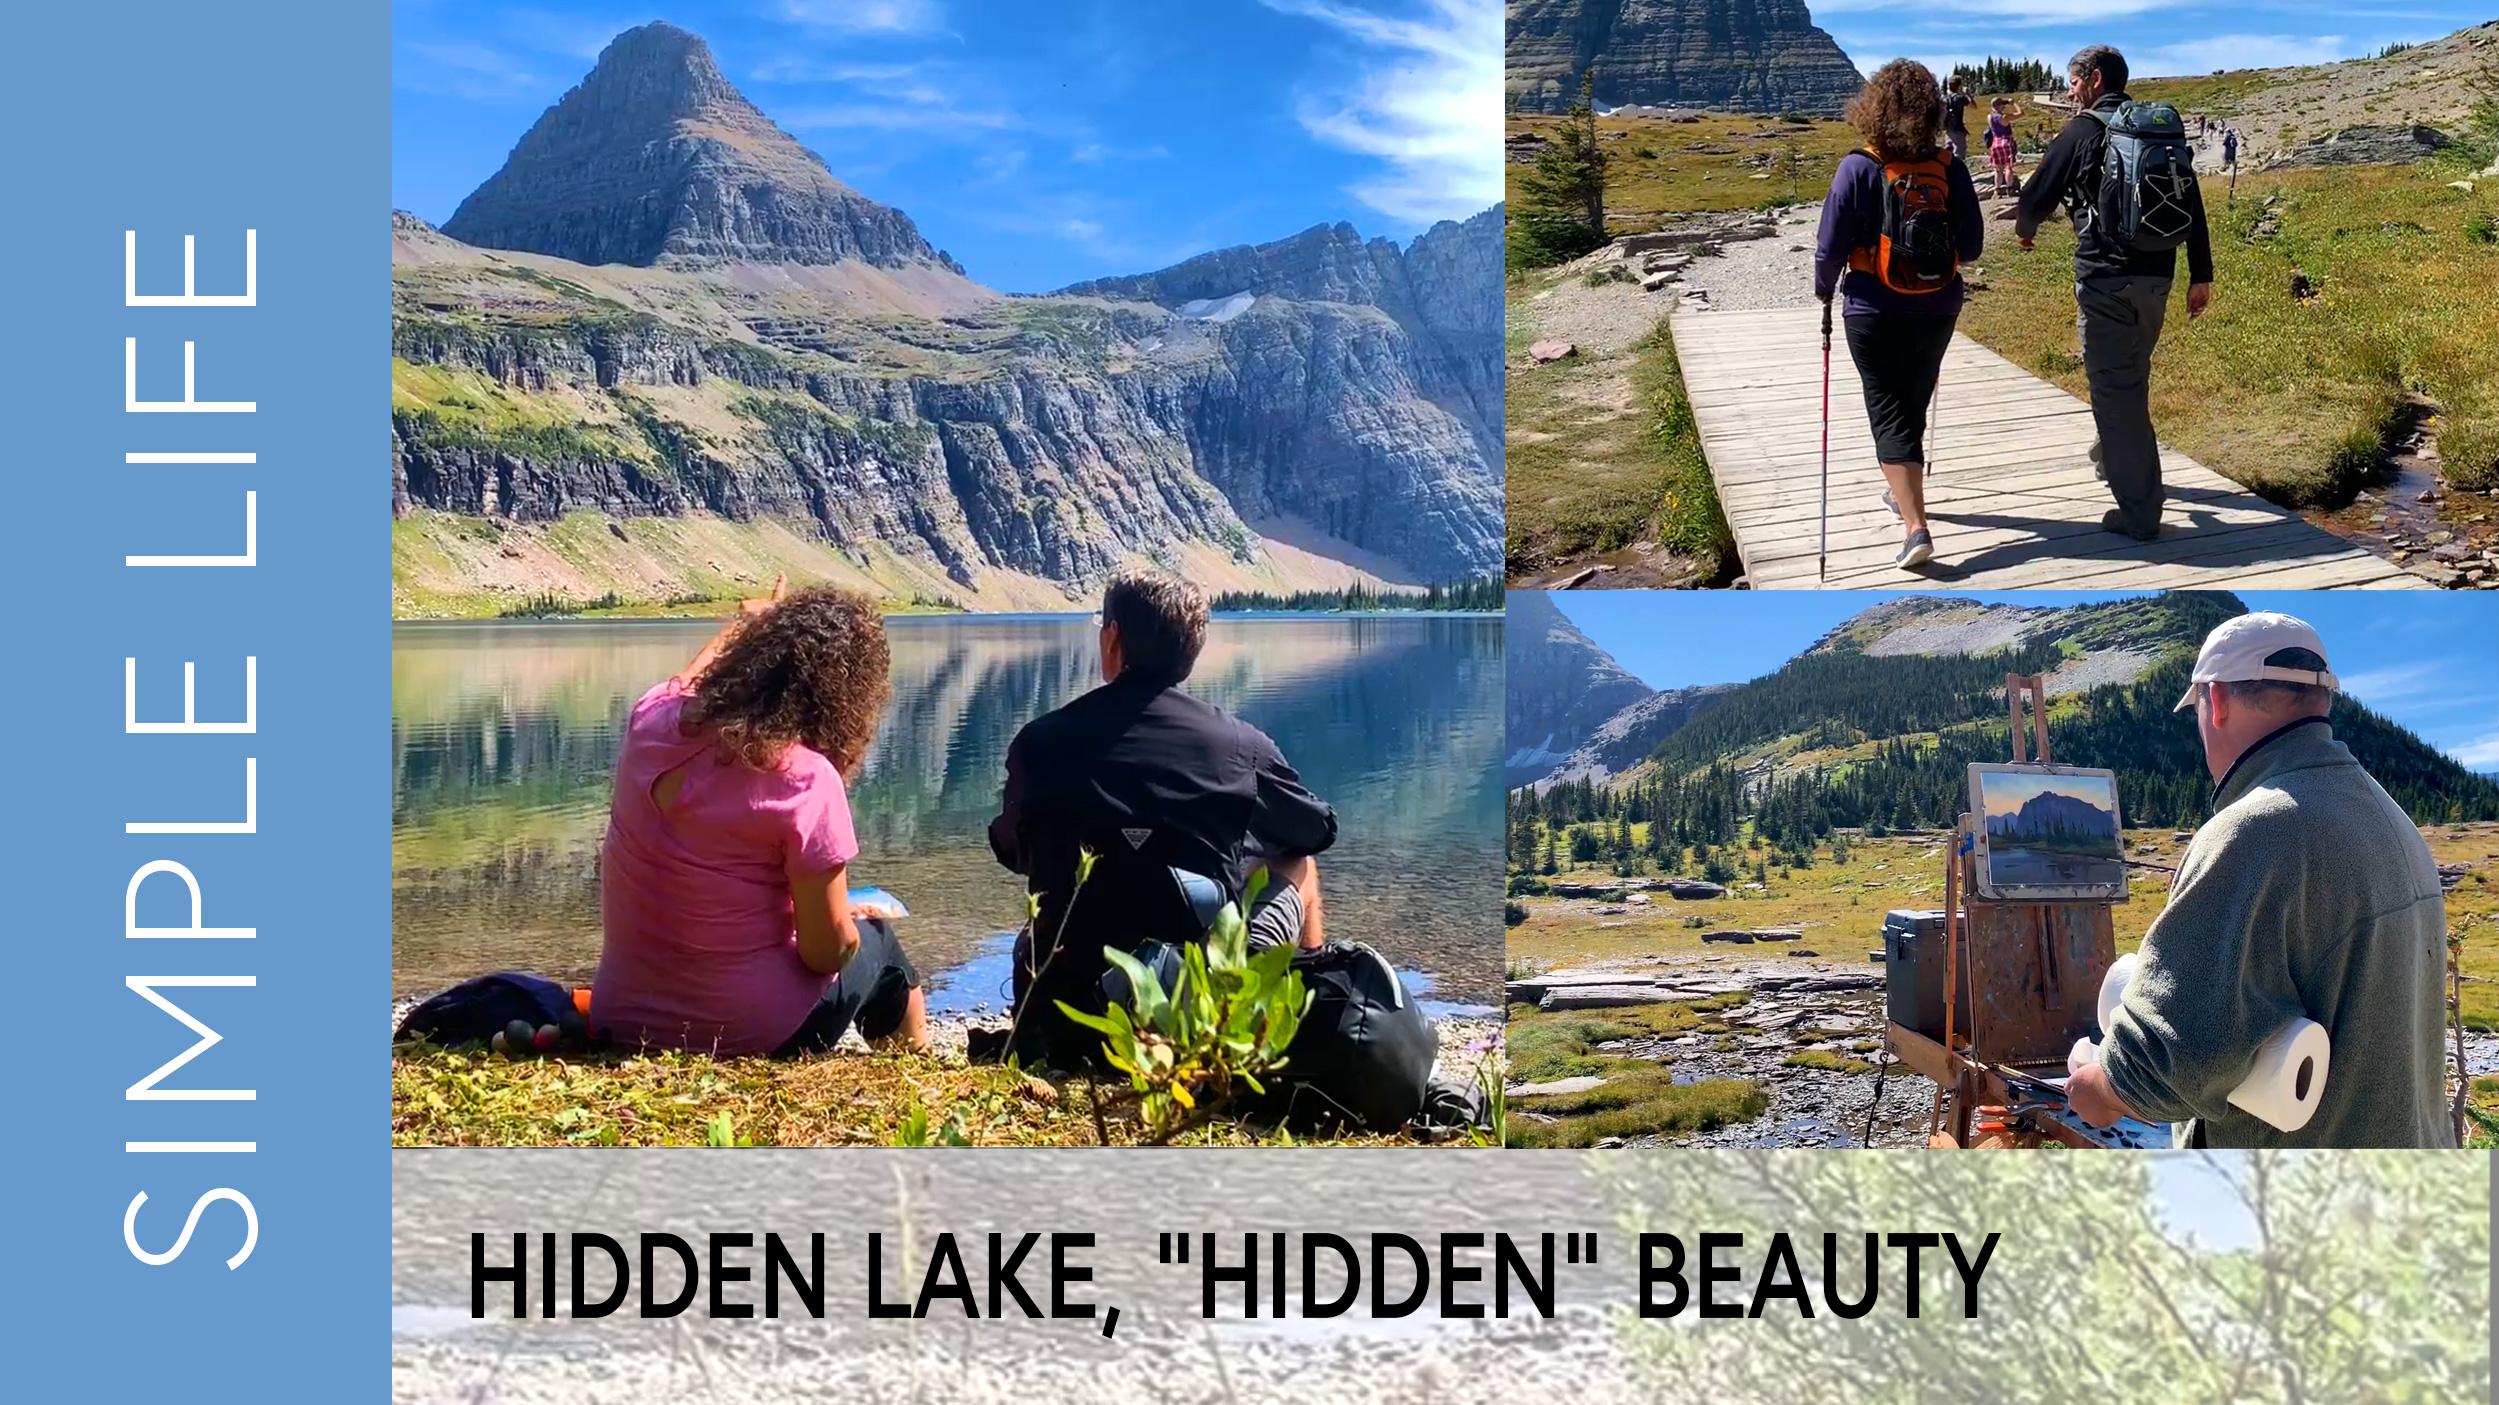 hidden-lake-beauty.jpg